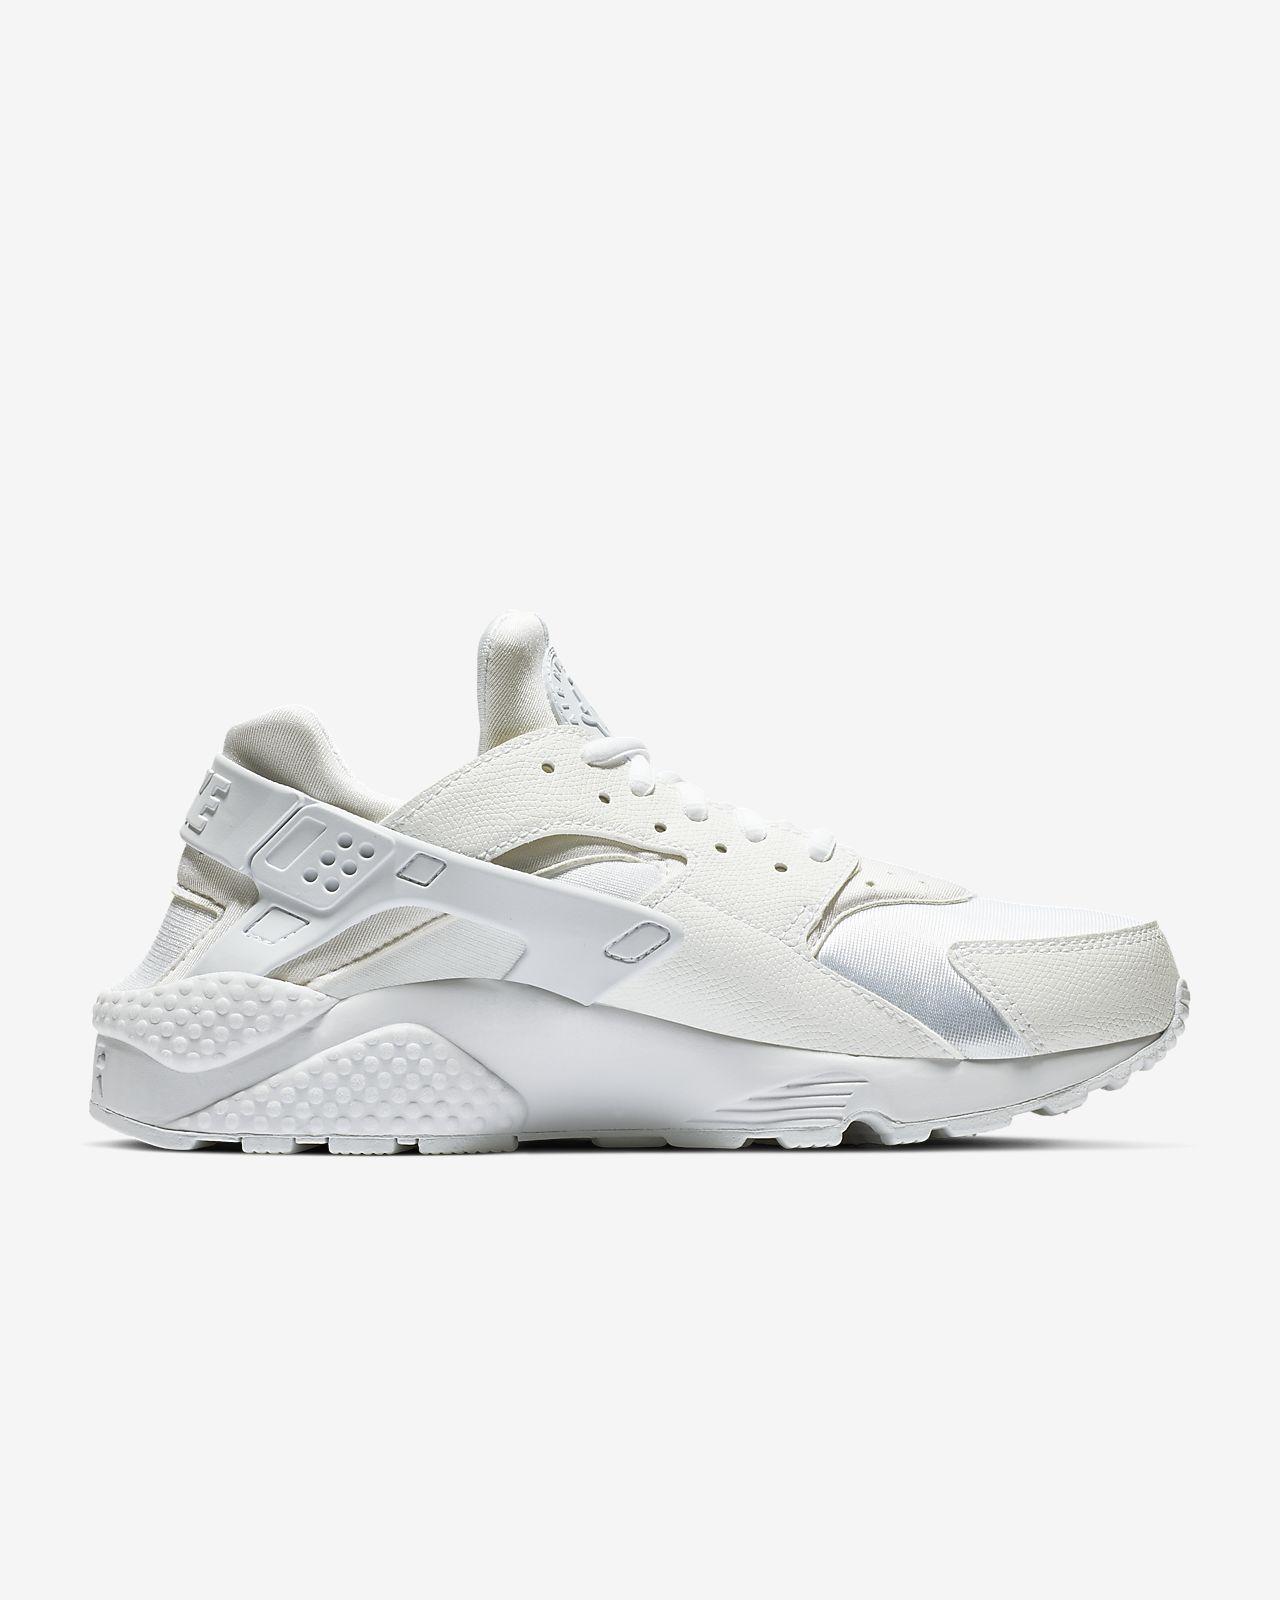 Billig Nike Air Huarache Damen Verkauf Kgg111